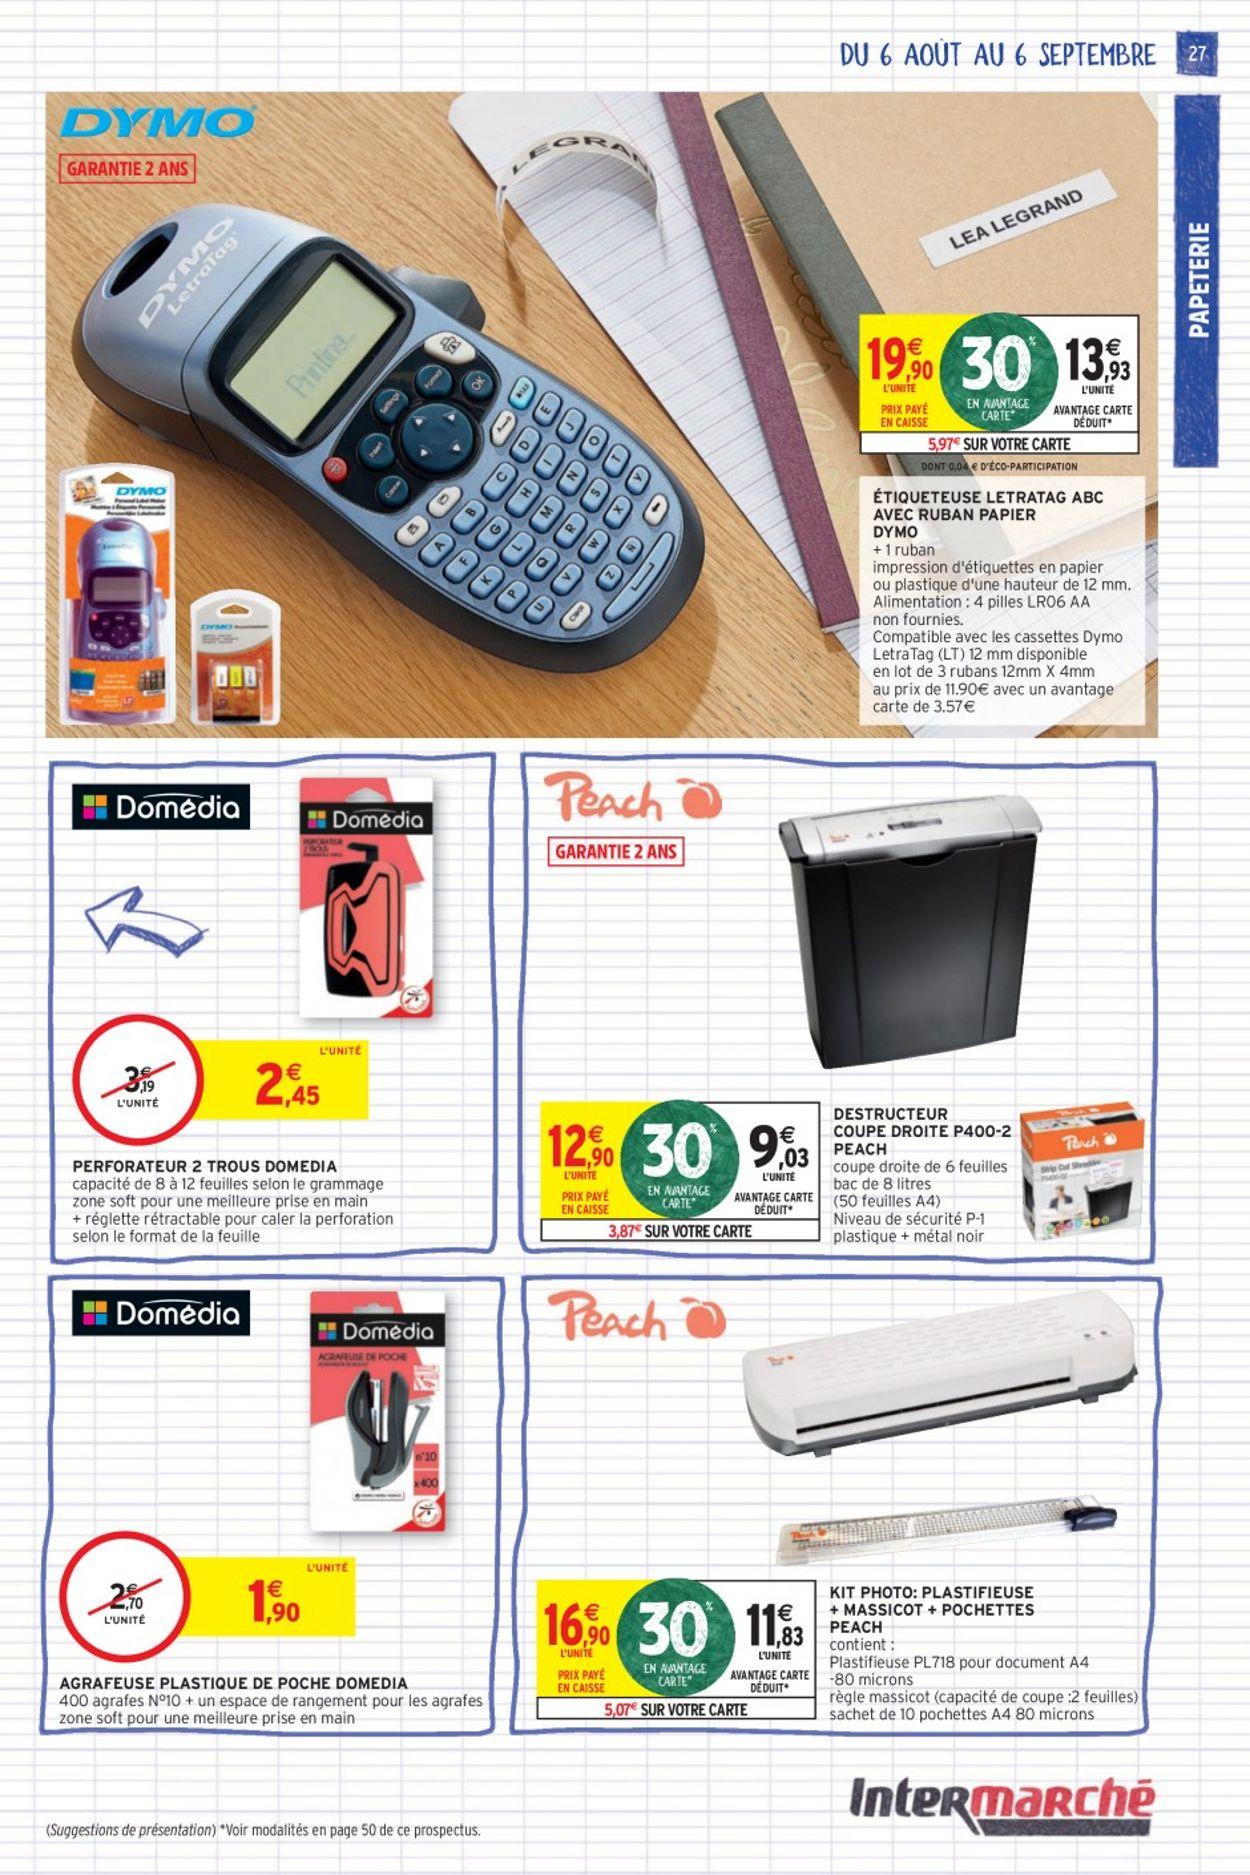 Intermarché Catalogue - 06.08-06.09.2020 (Page 27)